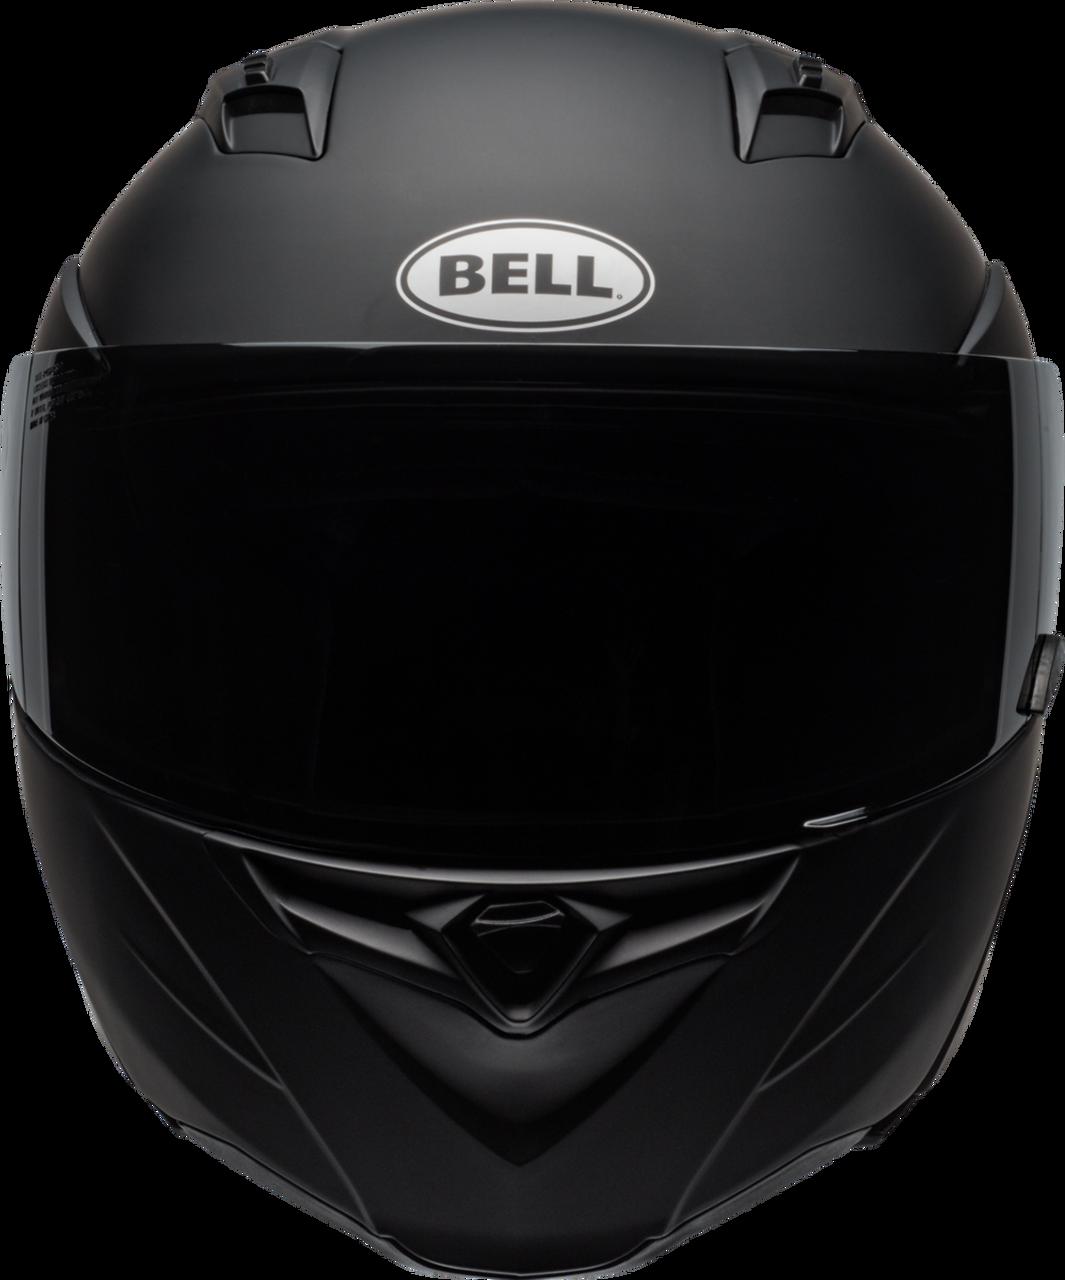 BELL REVOLVER EVO MATTE BLACK